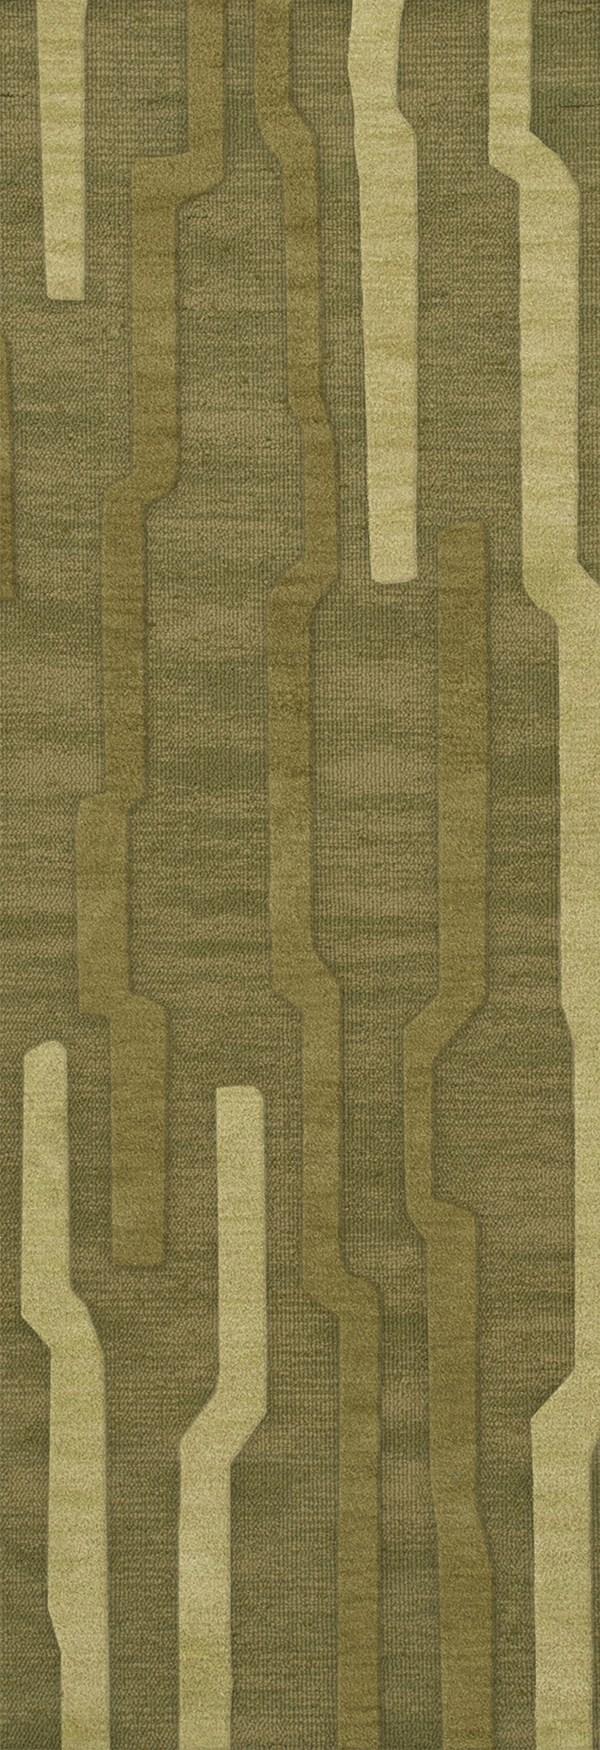 Tarragon, Green Transitional Area Rug